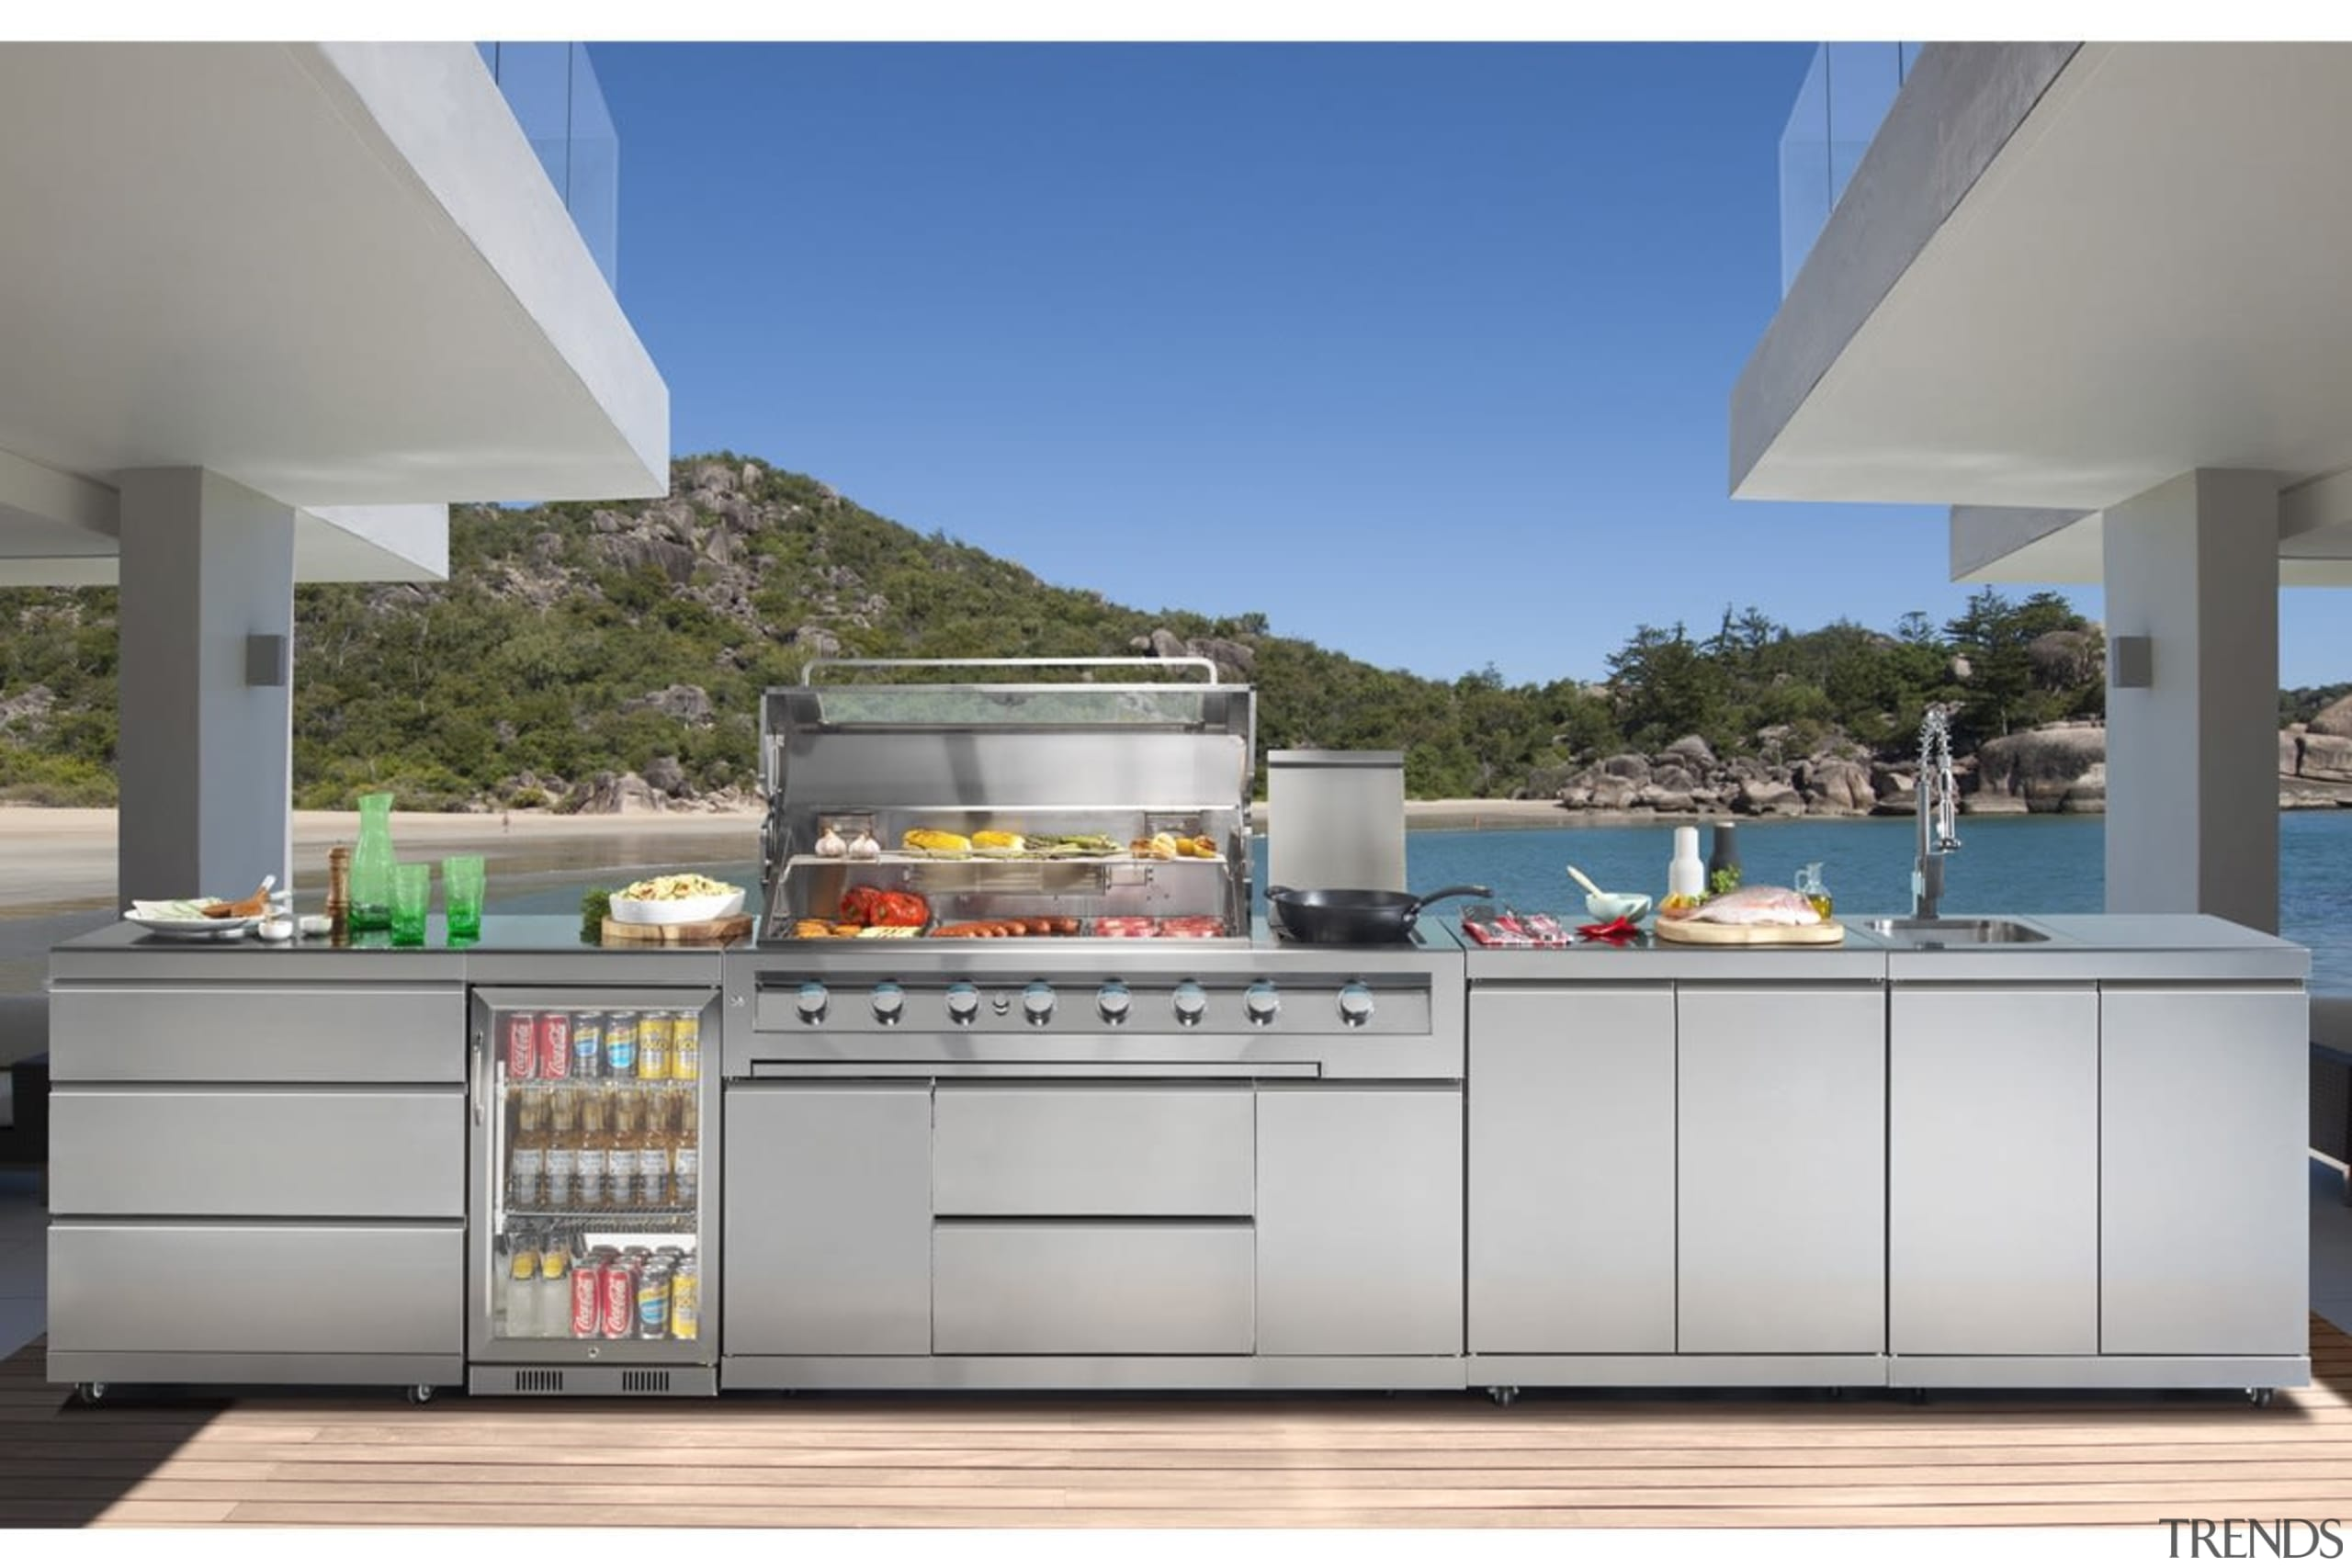 Gasmate Luxury Outdoor Kitchens - countertop | kitchen countertop, kitchen, gray